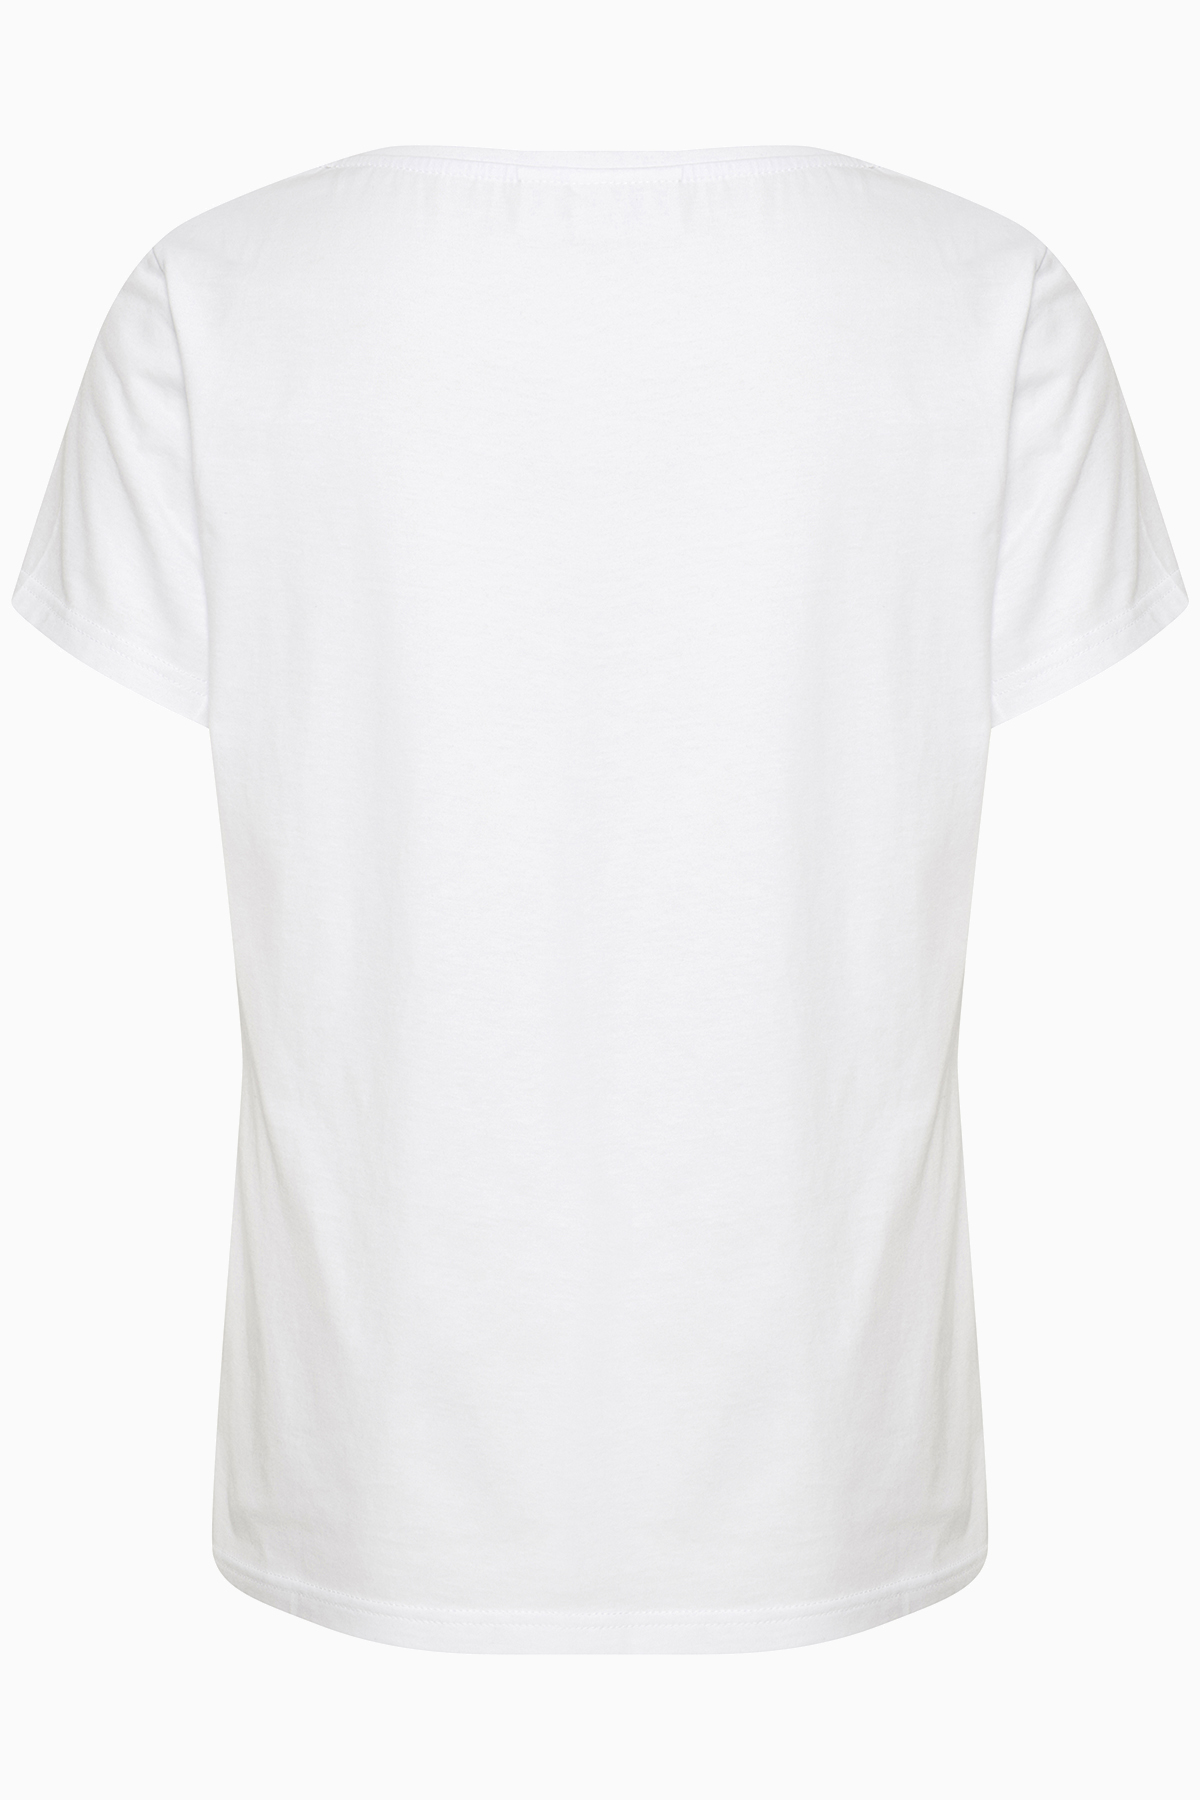 Off-white/fuchsia T-shirt korte mouw van Kaffe – Door Off-white/fuchsia T-shirt korte mouw van maat. L-XXL hier